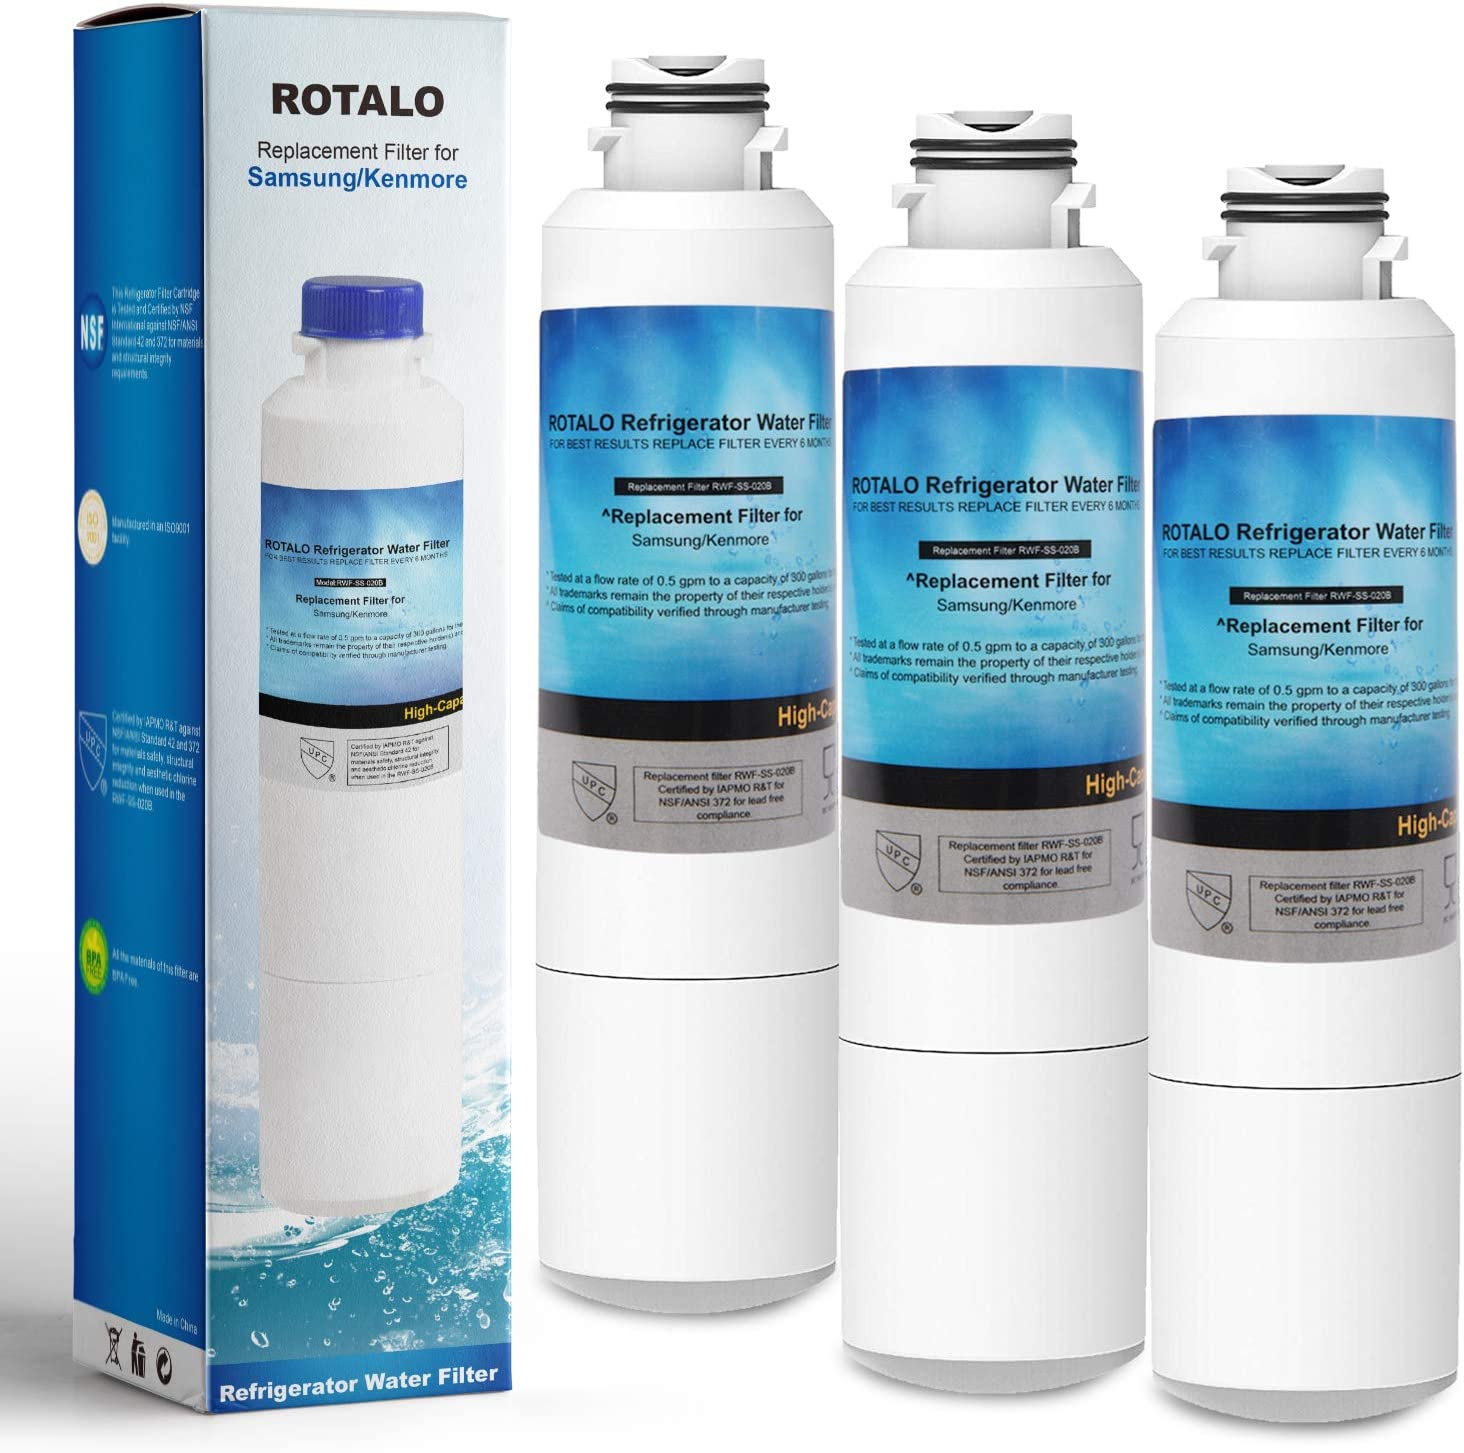 DA29-00020B Refrigerator Water Filter, ROTALO NSF 42&372 Certified Refrigerator Water Filter Replacement for Samsung DA29-00020 Refrigerator Water Filter, Pack of 3